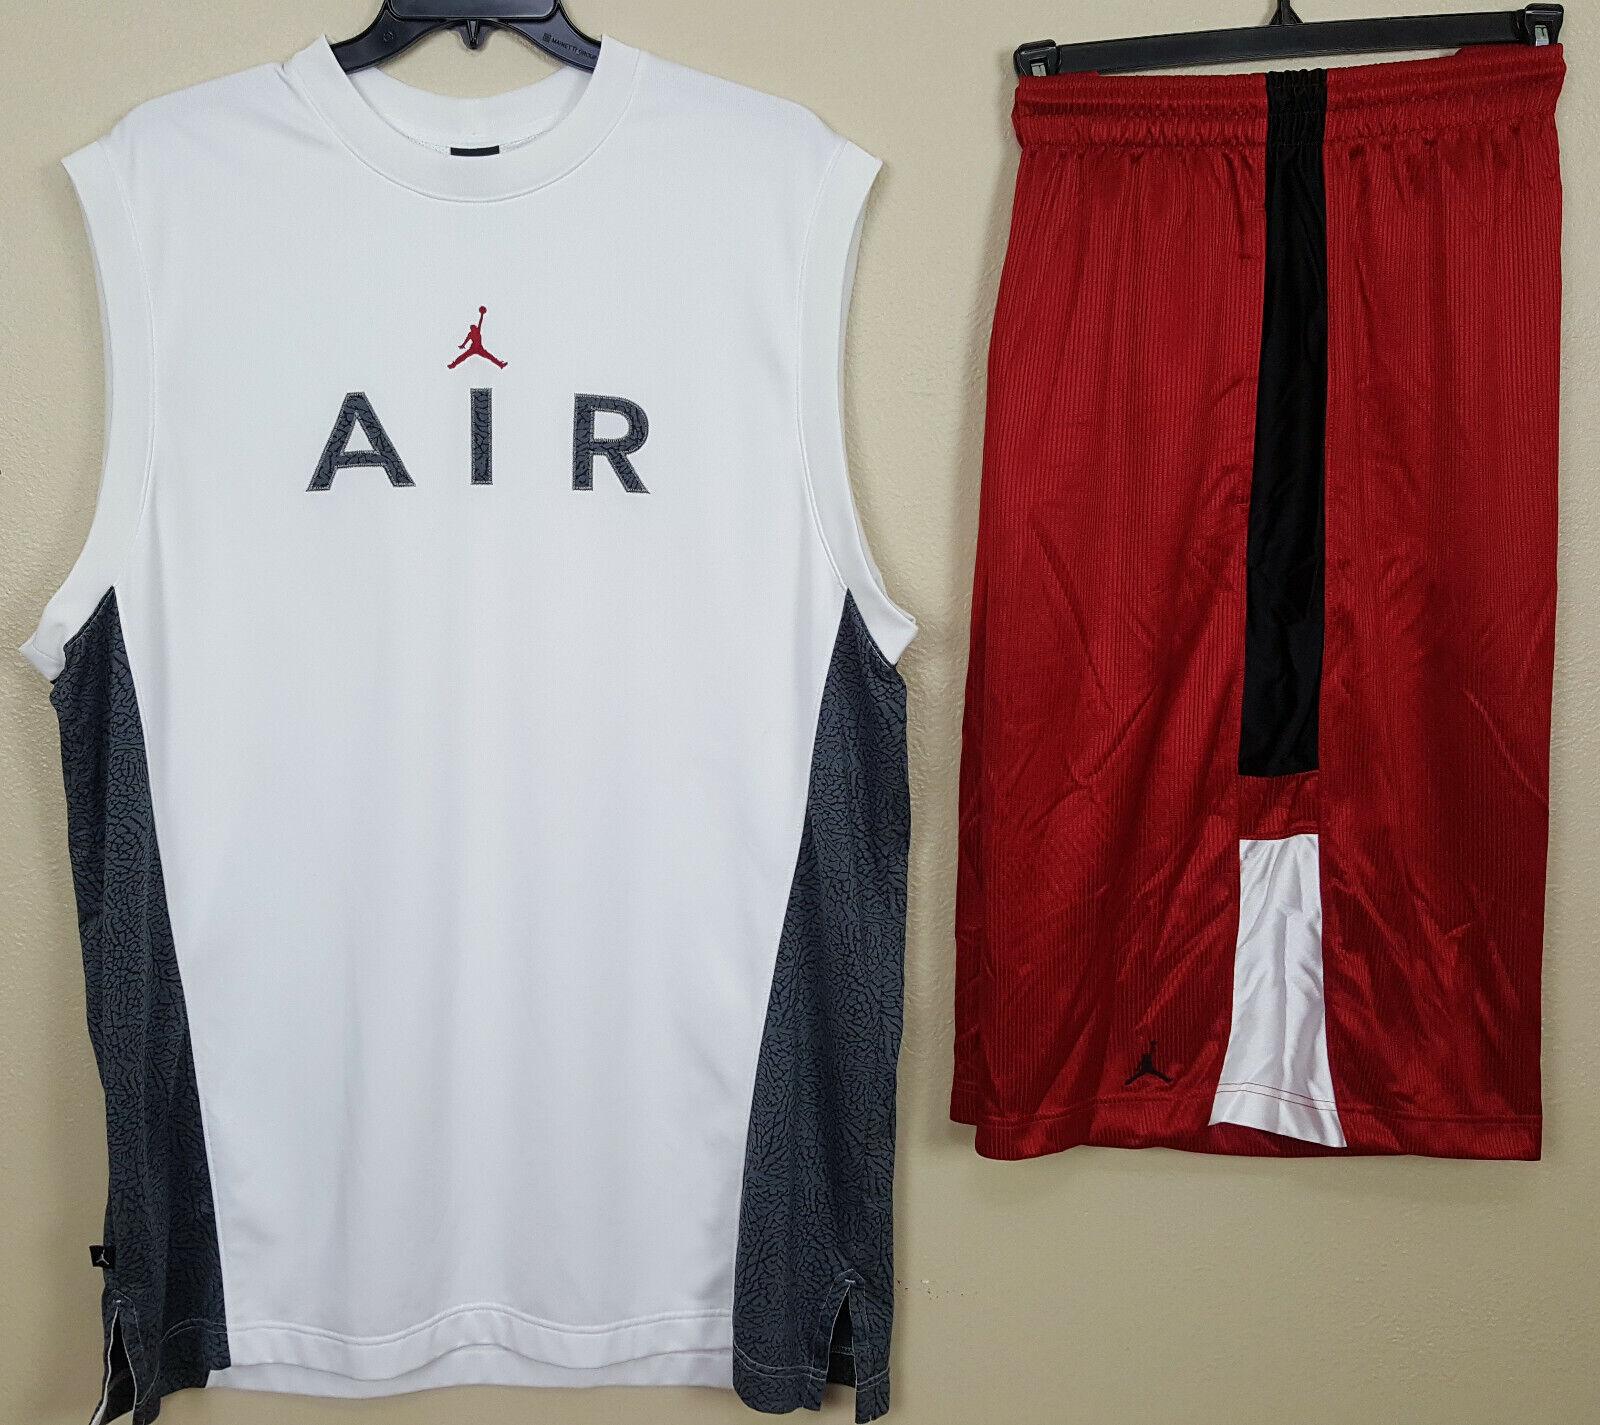 Nike Air Jordan 3 Outfit Shirt Shorts White Black Red Grey